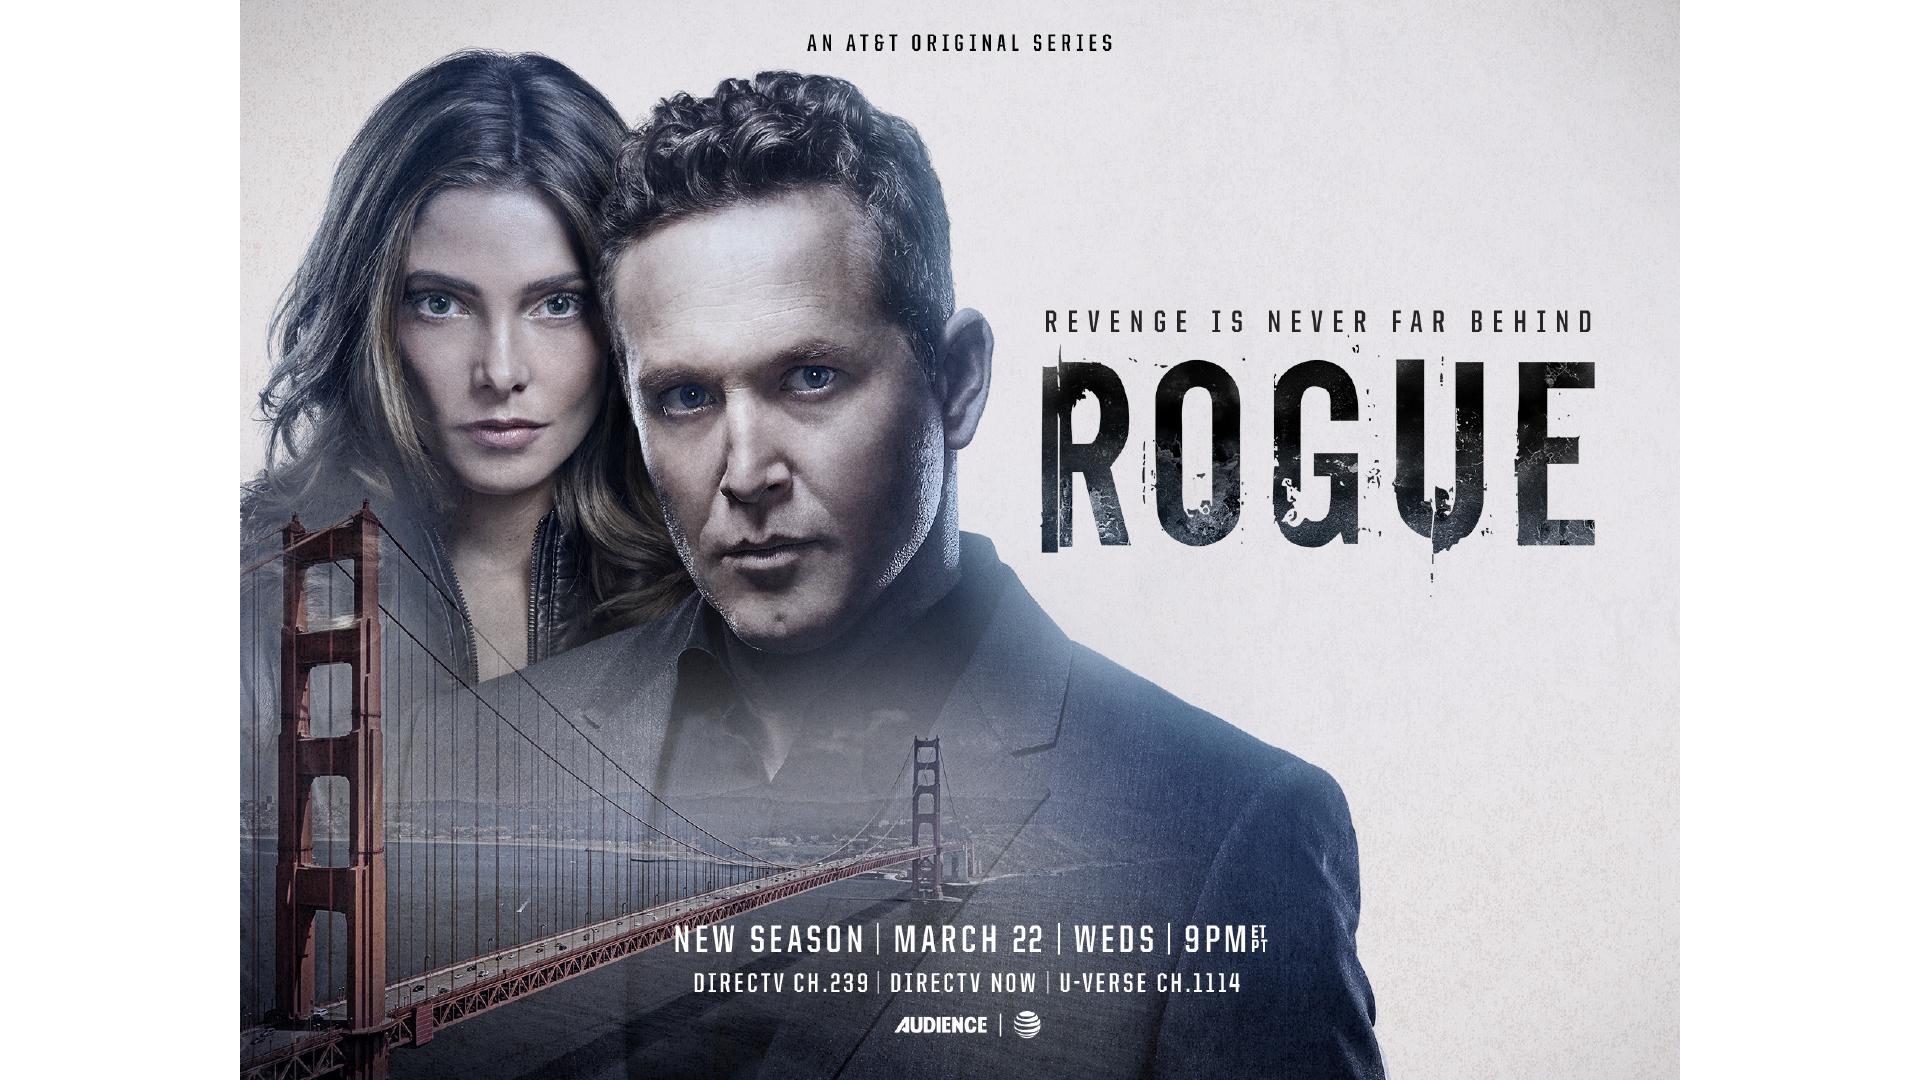 RogueS4_01-3.jpg